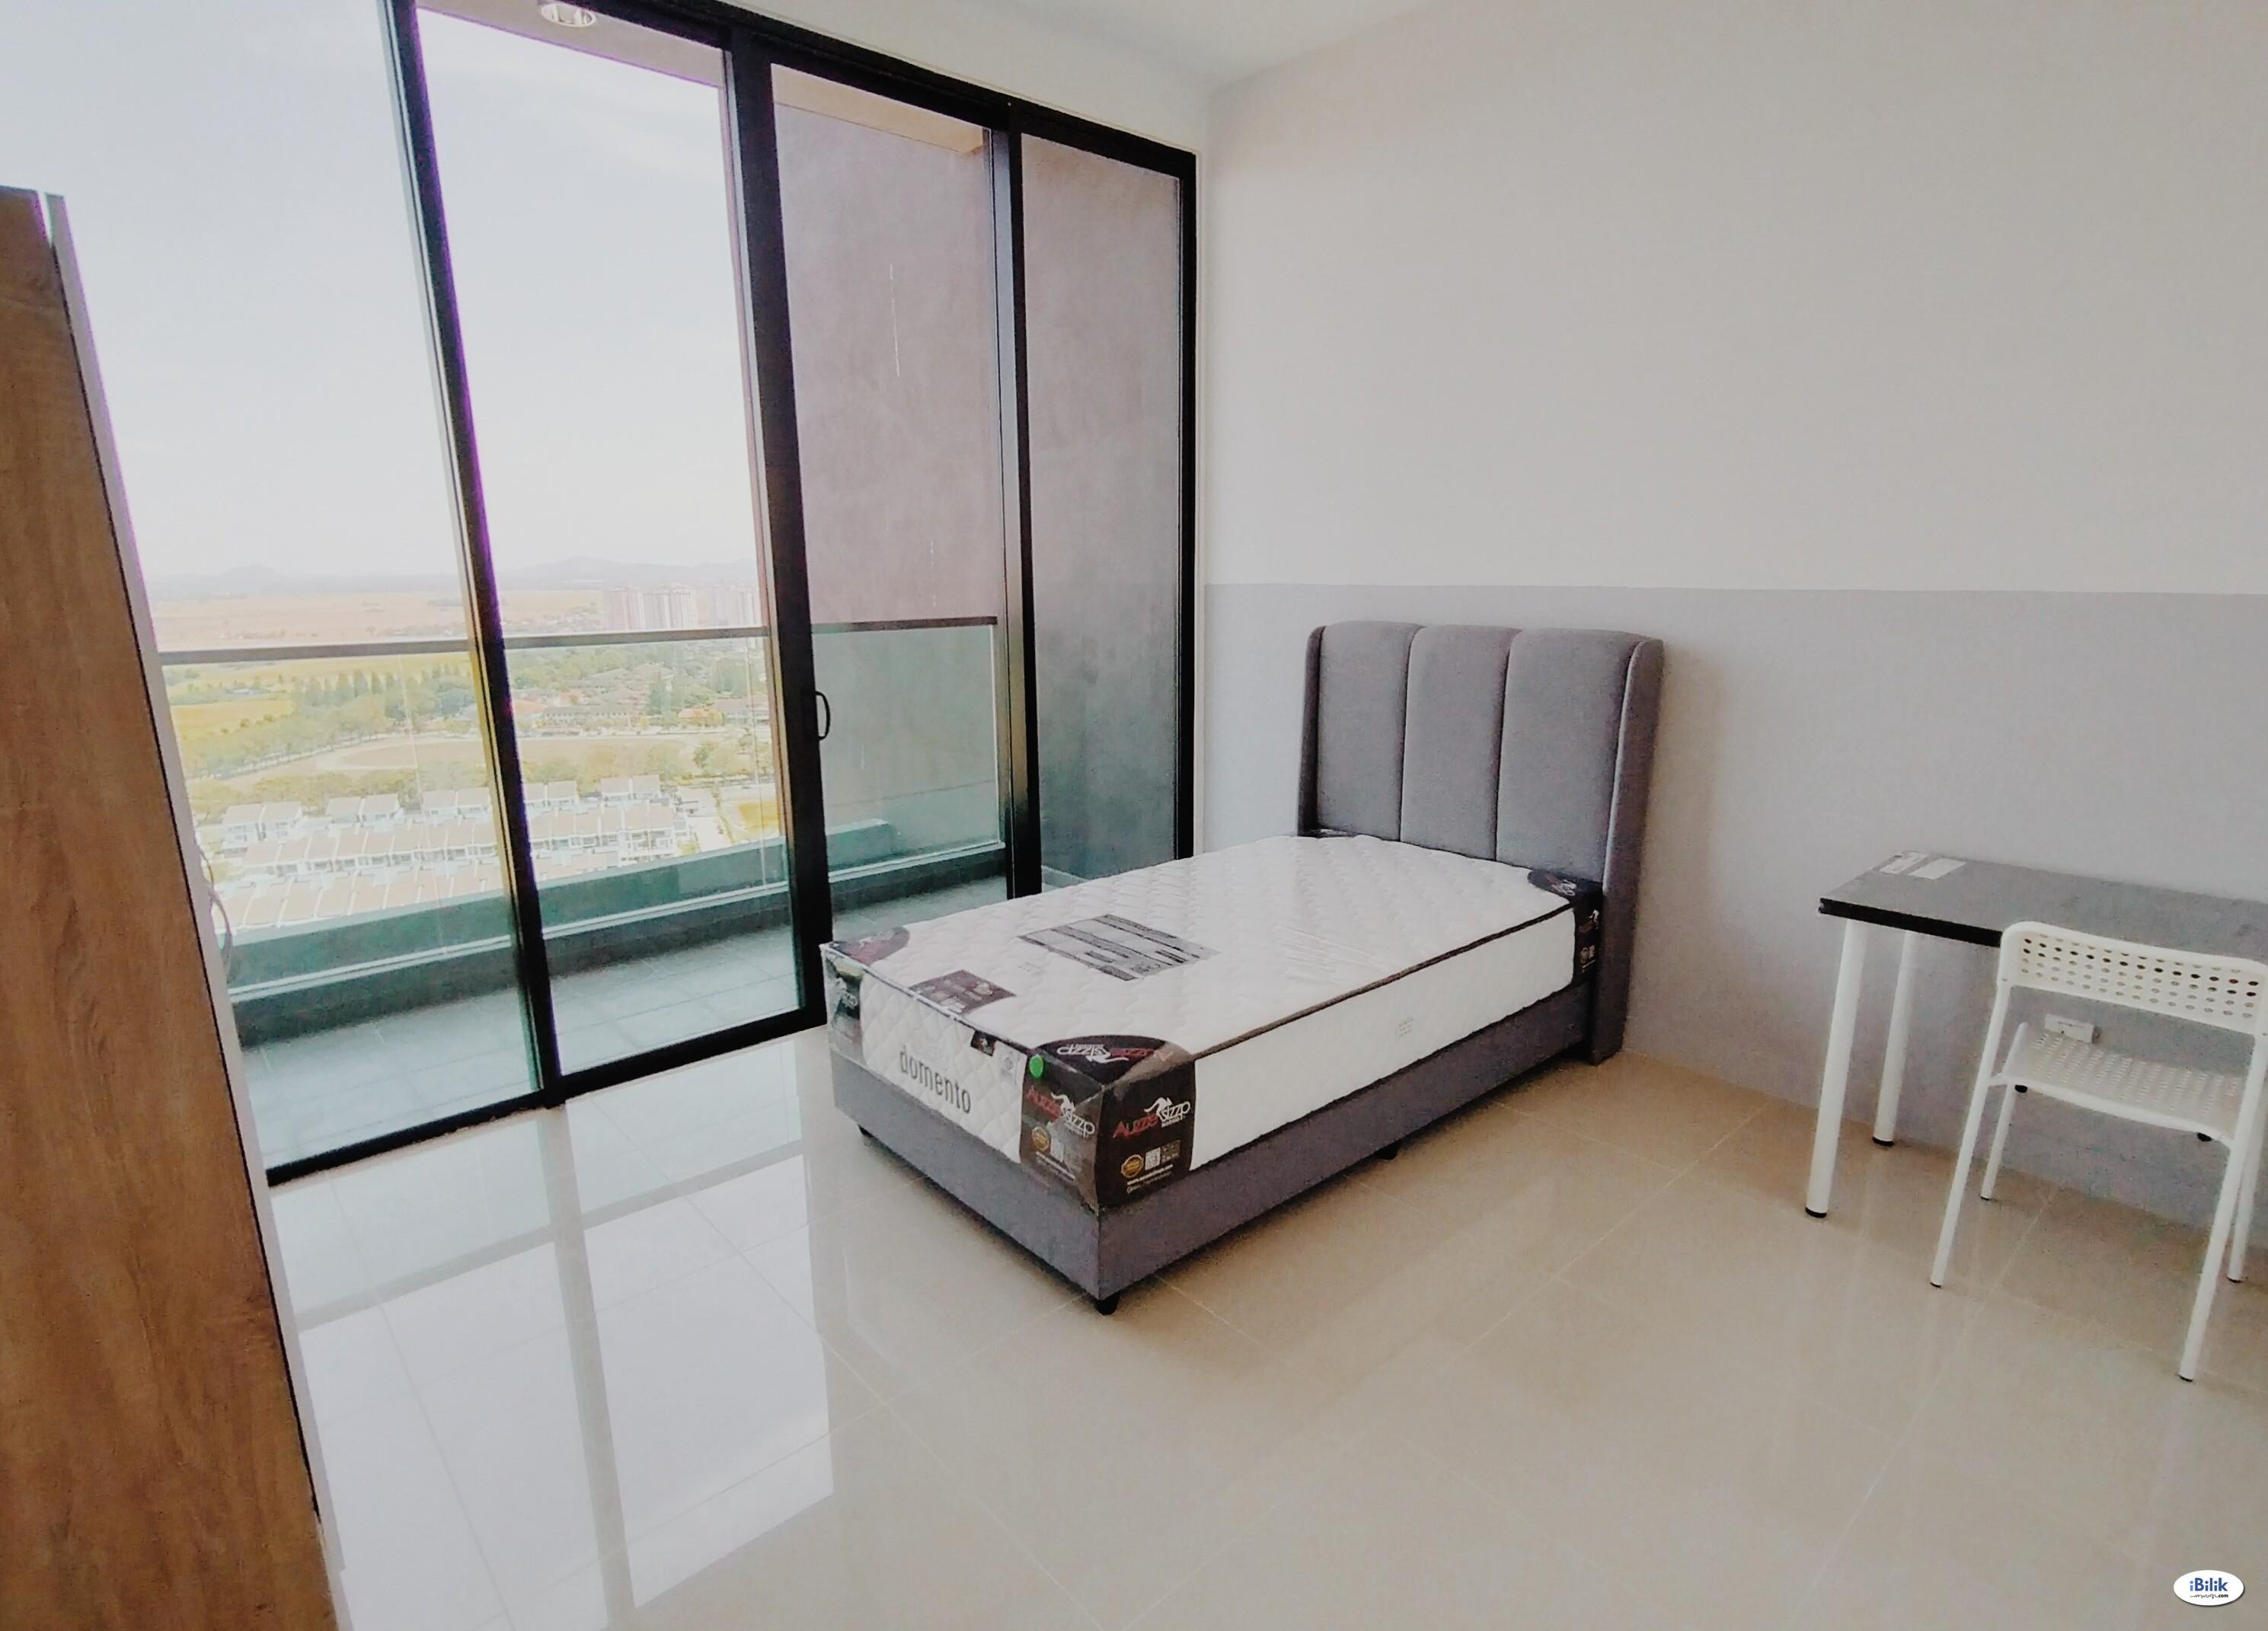 Evoke Residence - [ Balcony Room ] Fully Furnished at Seberang Perai, Penang